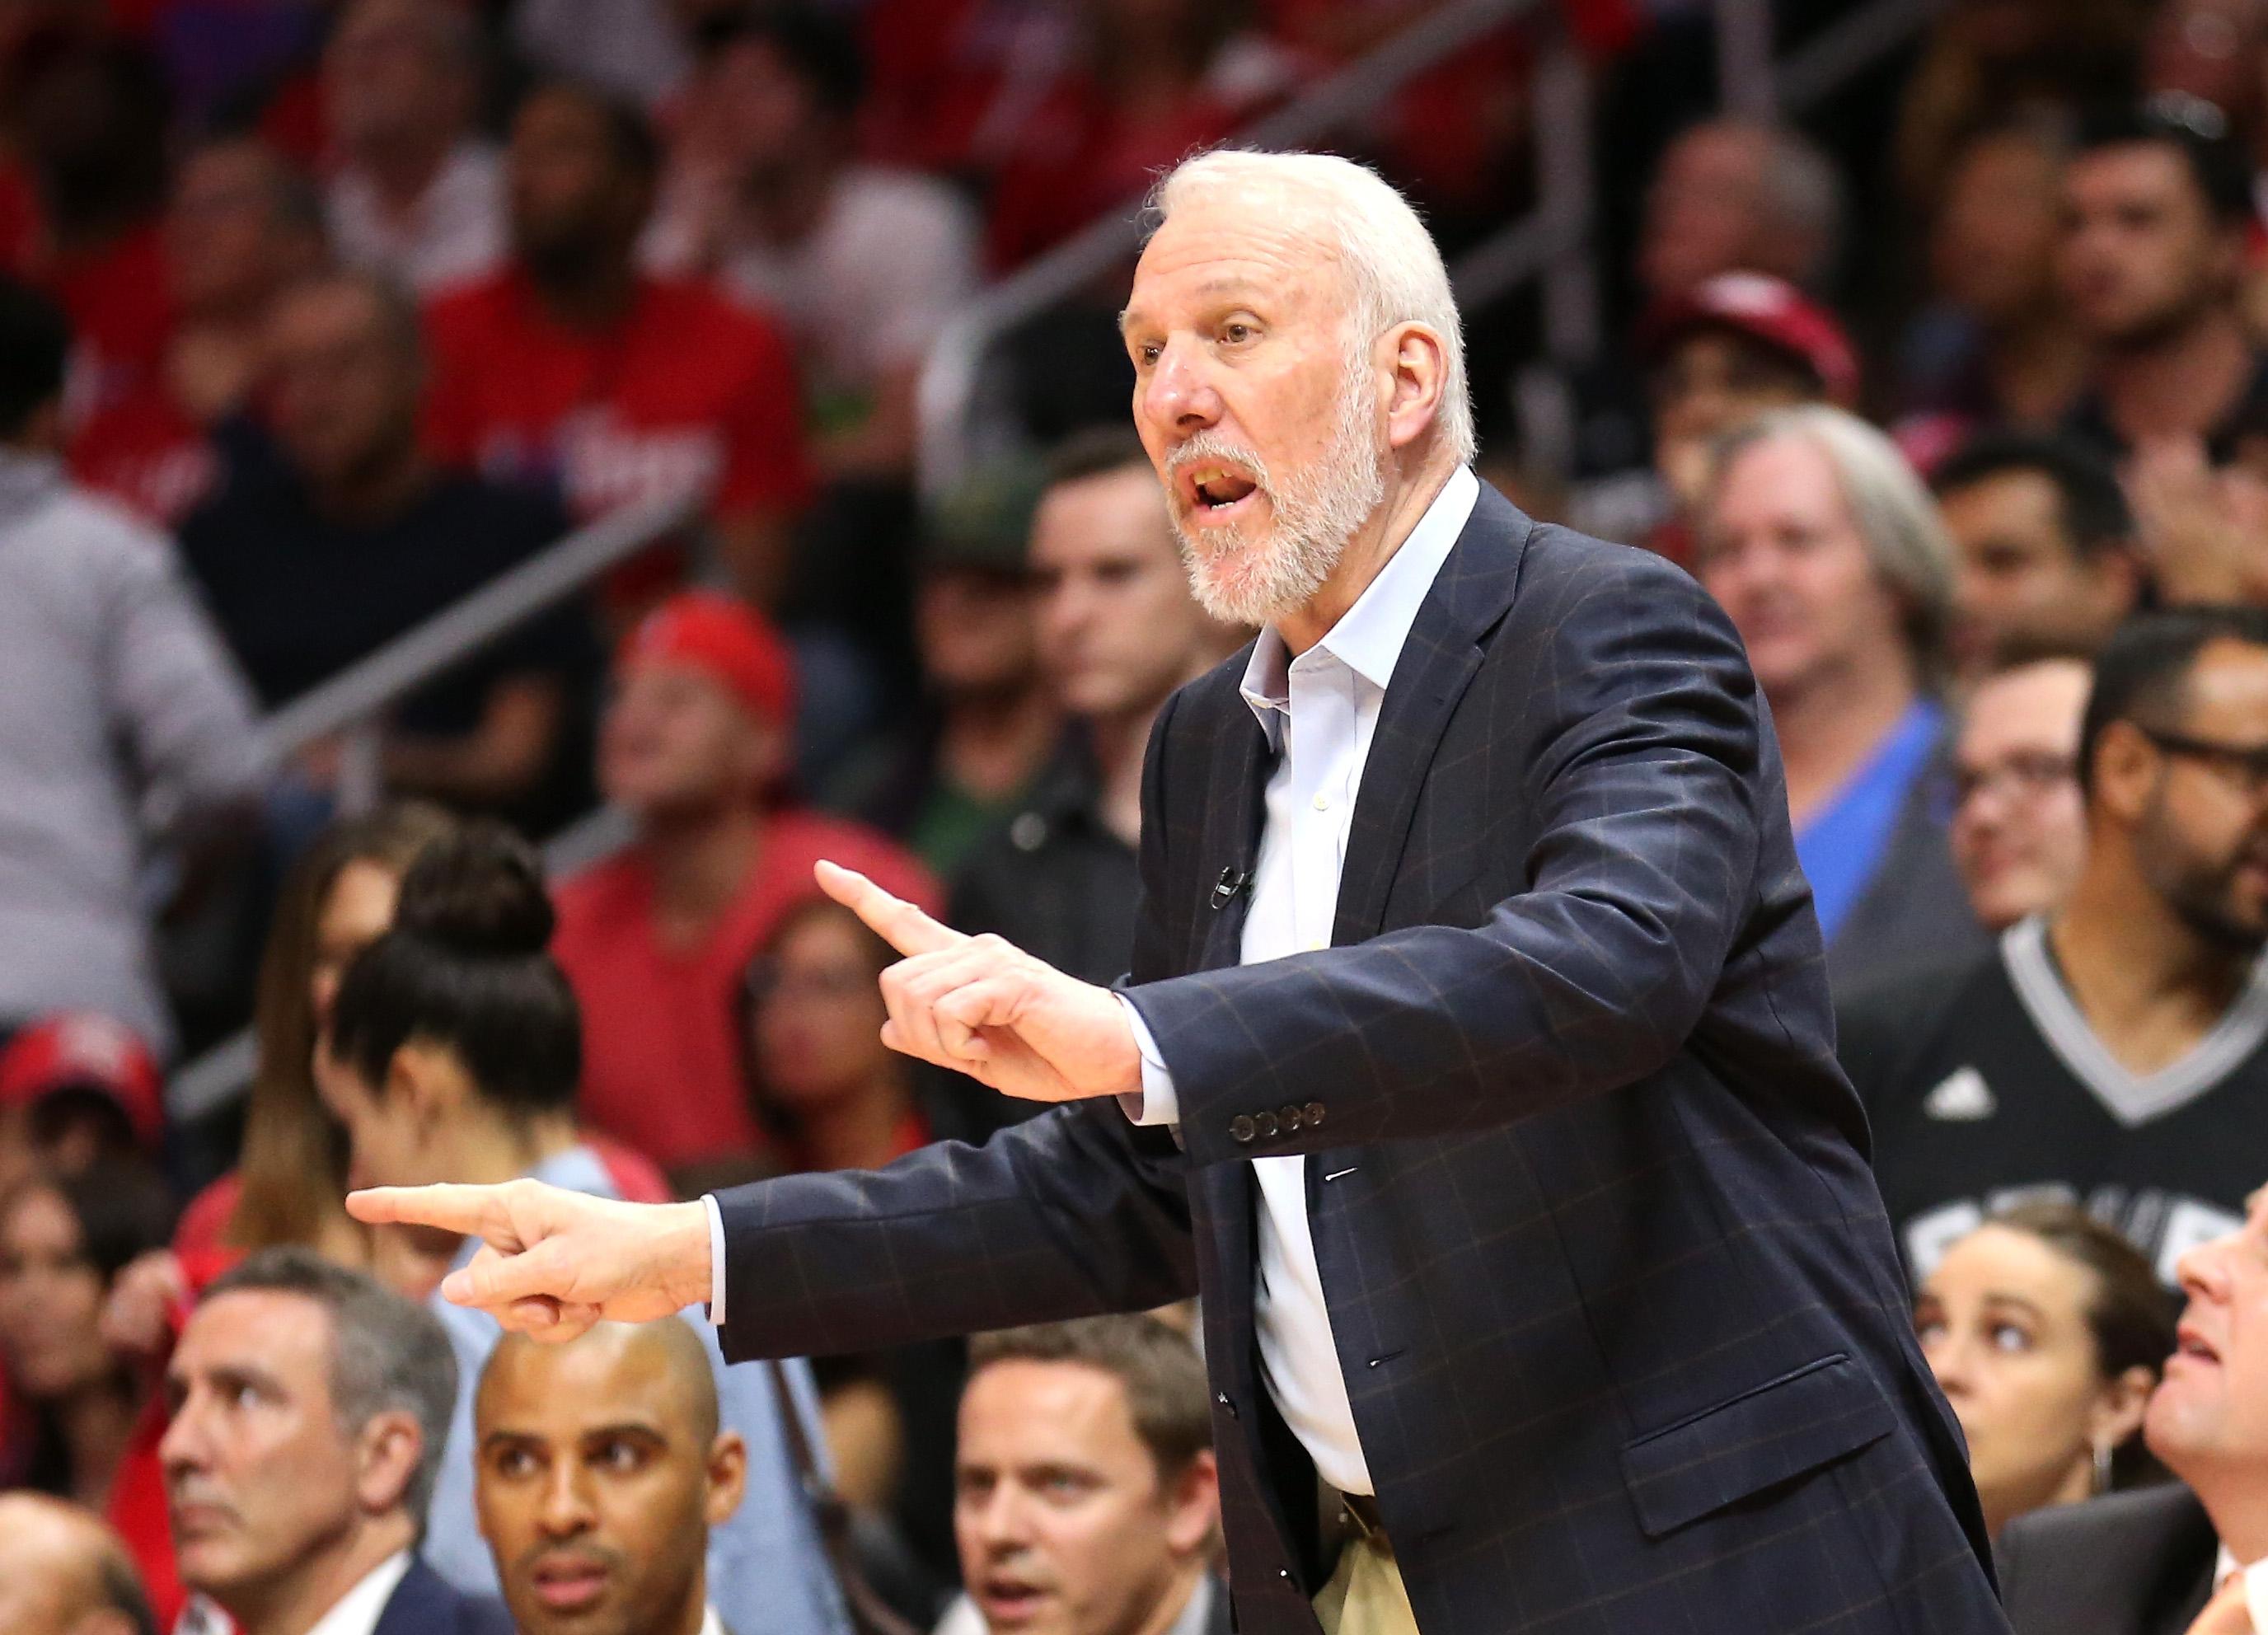 Gregg Popovich has won five NBA titles as Spurs head coach. (Getty)